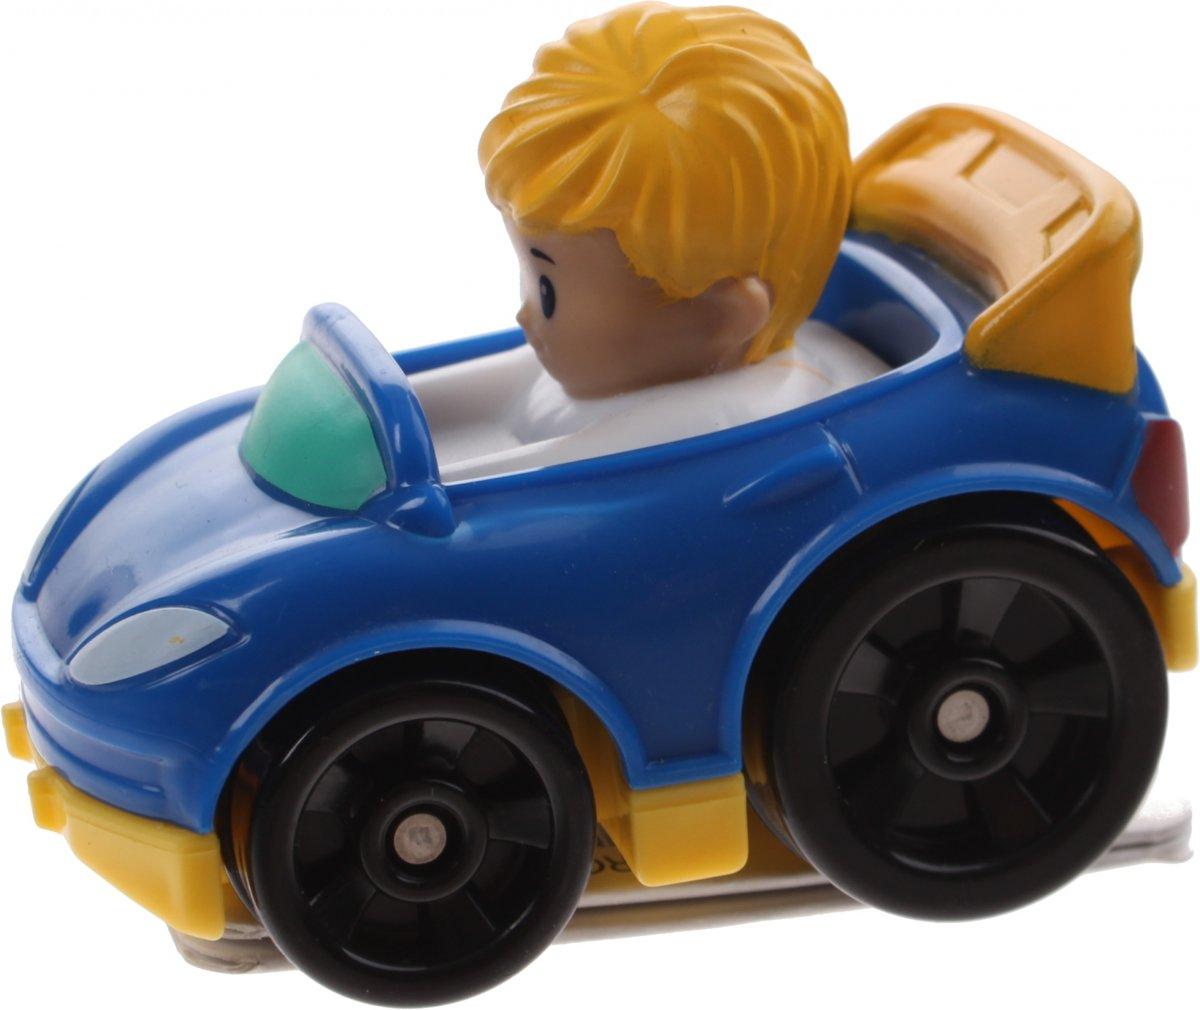 Fisher-price Little People Wheelies Auto 6,5 Cm Blauw (drg96)